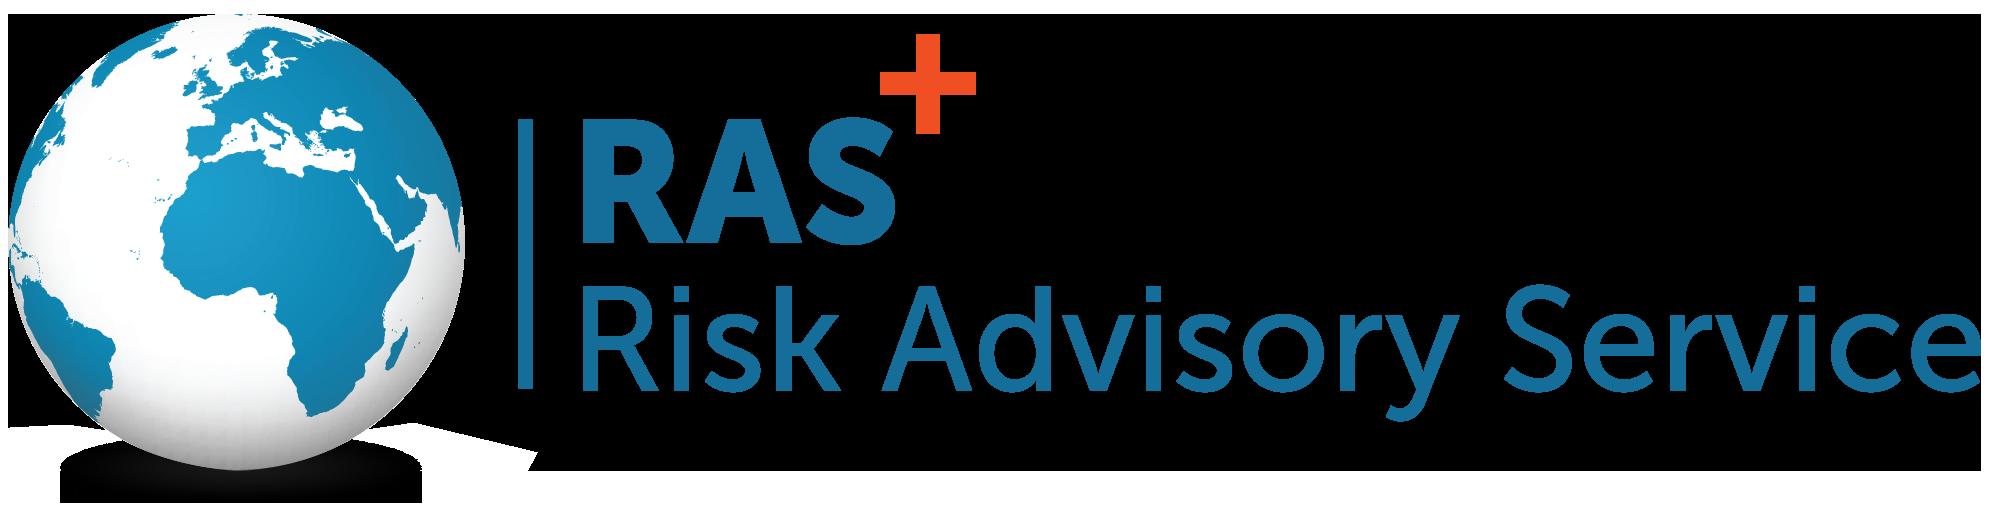 RAS: Risk Advisory Service